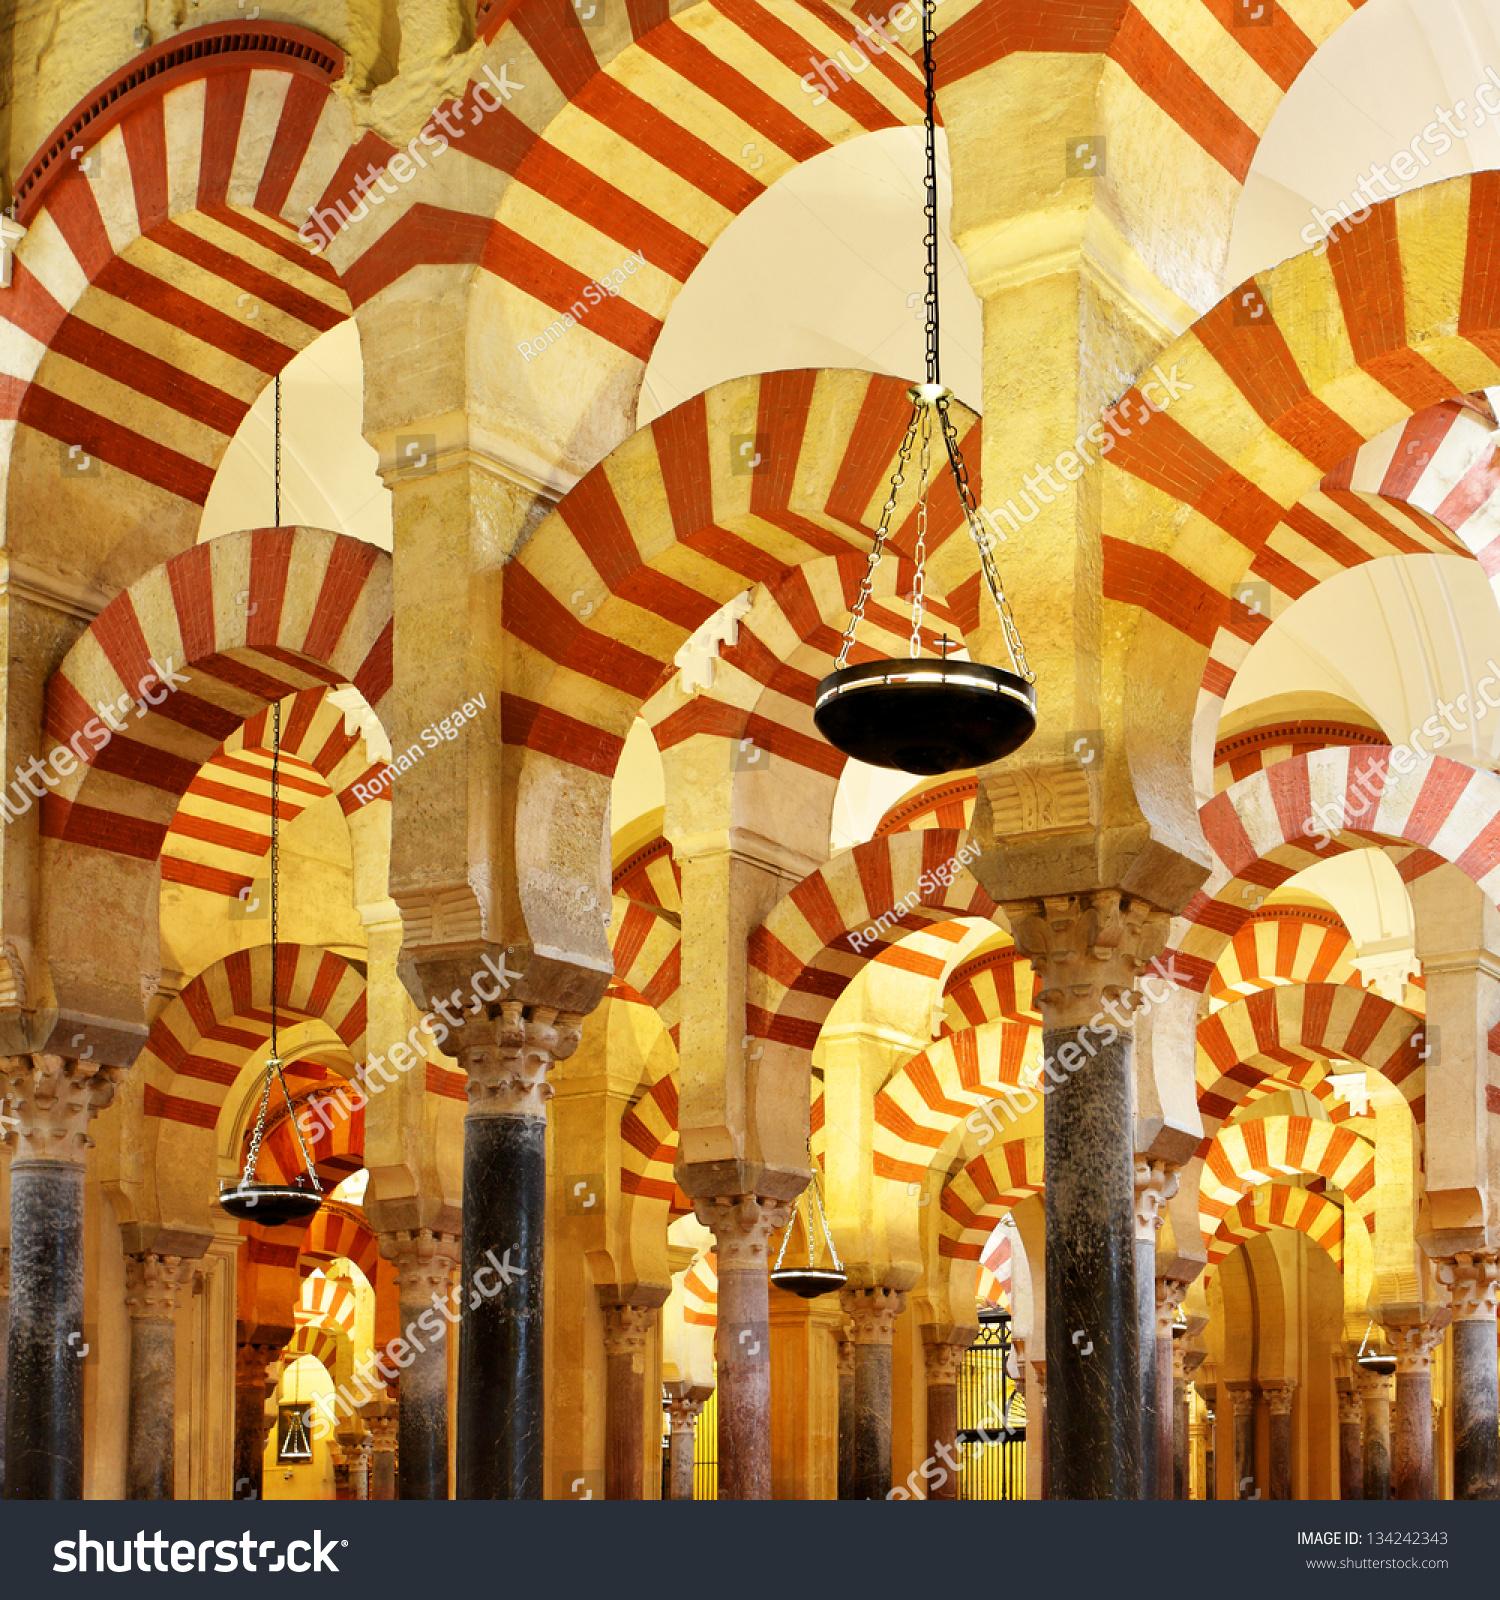 The Great Mosque Of Cordoba (La Mezquita), Spain Stock Photo 134242343 : Shut...